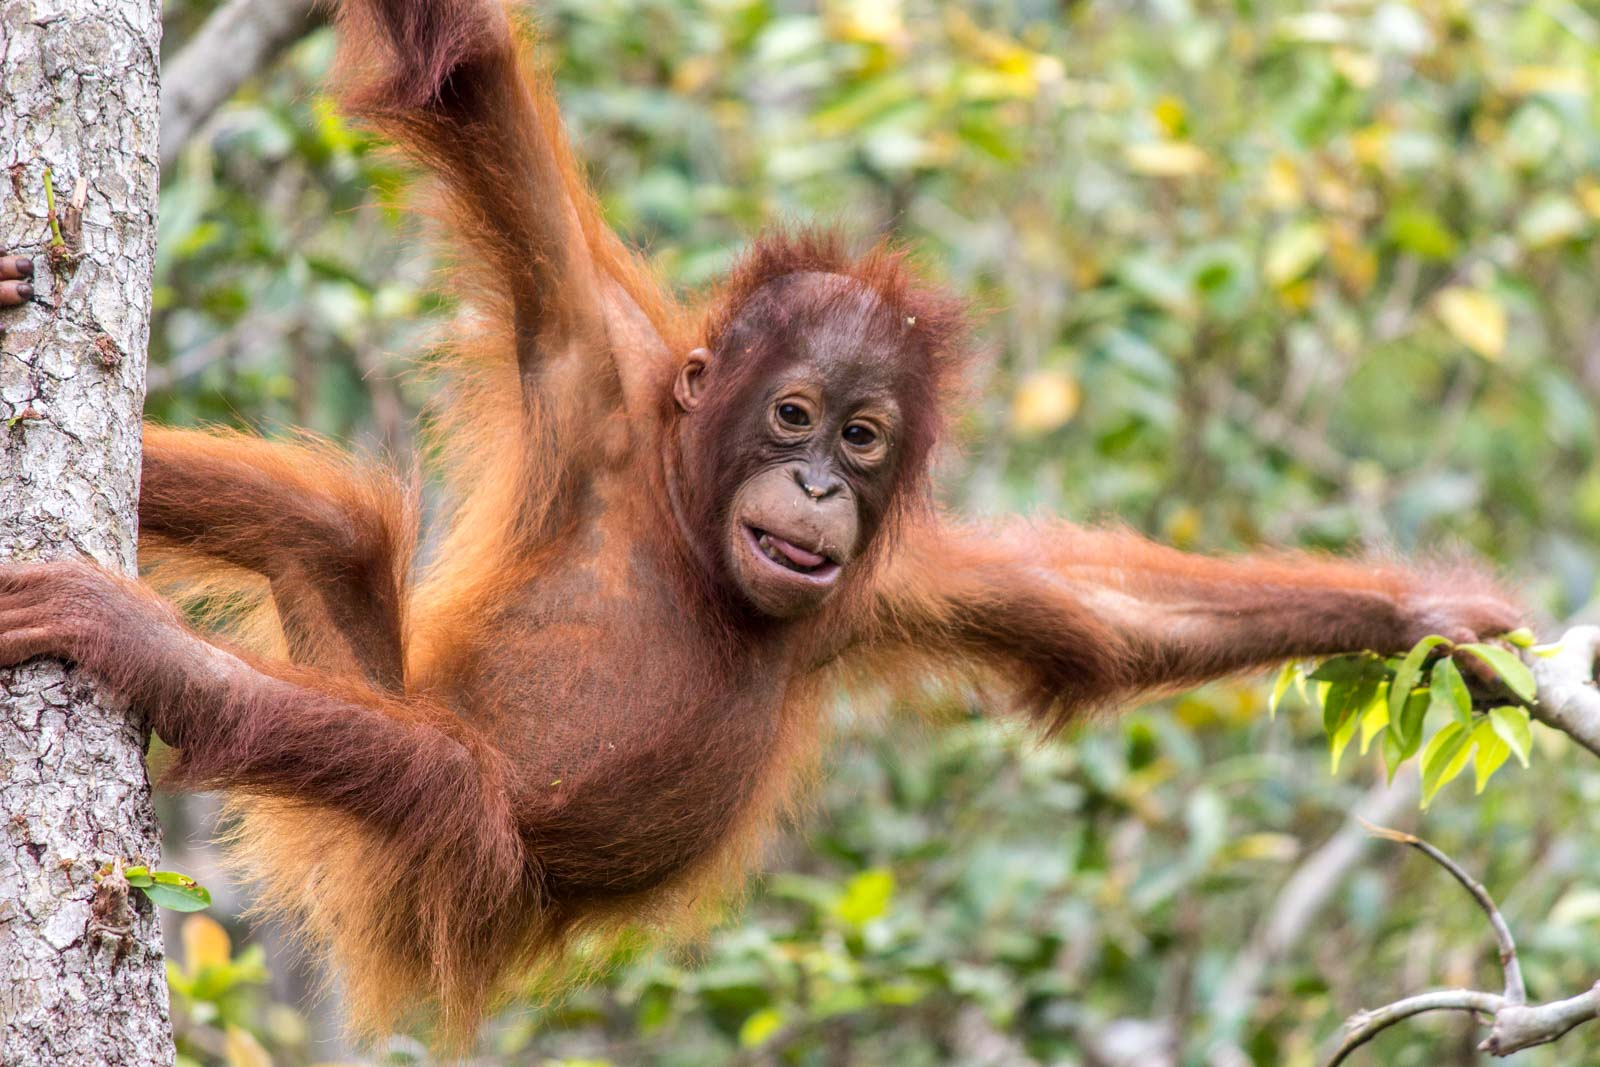 Tanjung Puting Orangutan Tour, Kalimantan, Indonesia